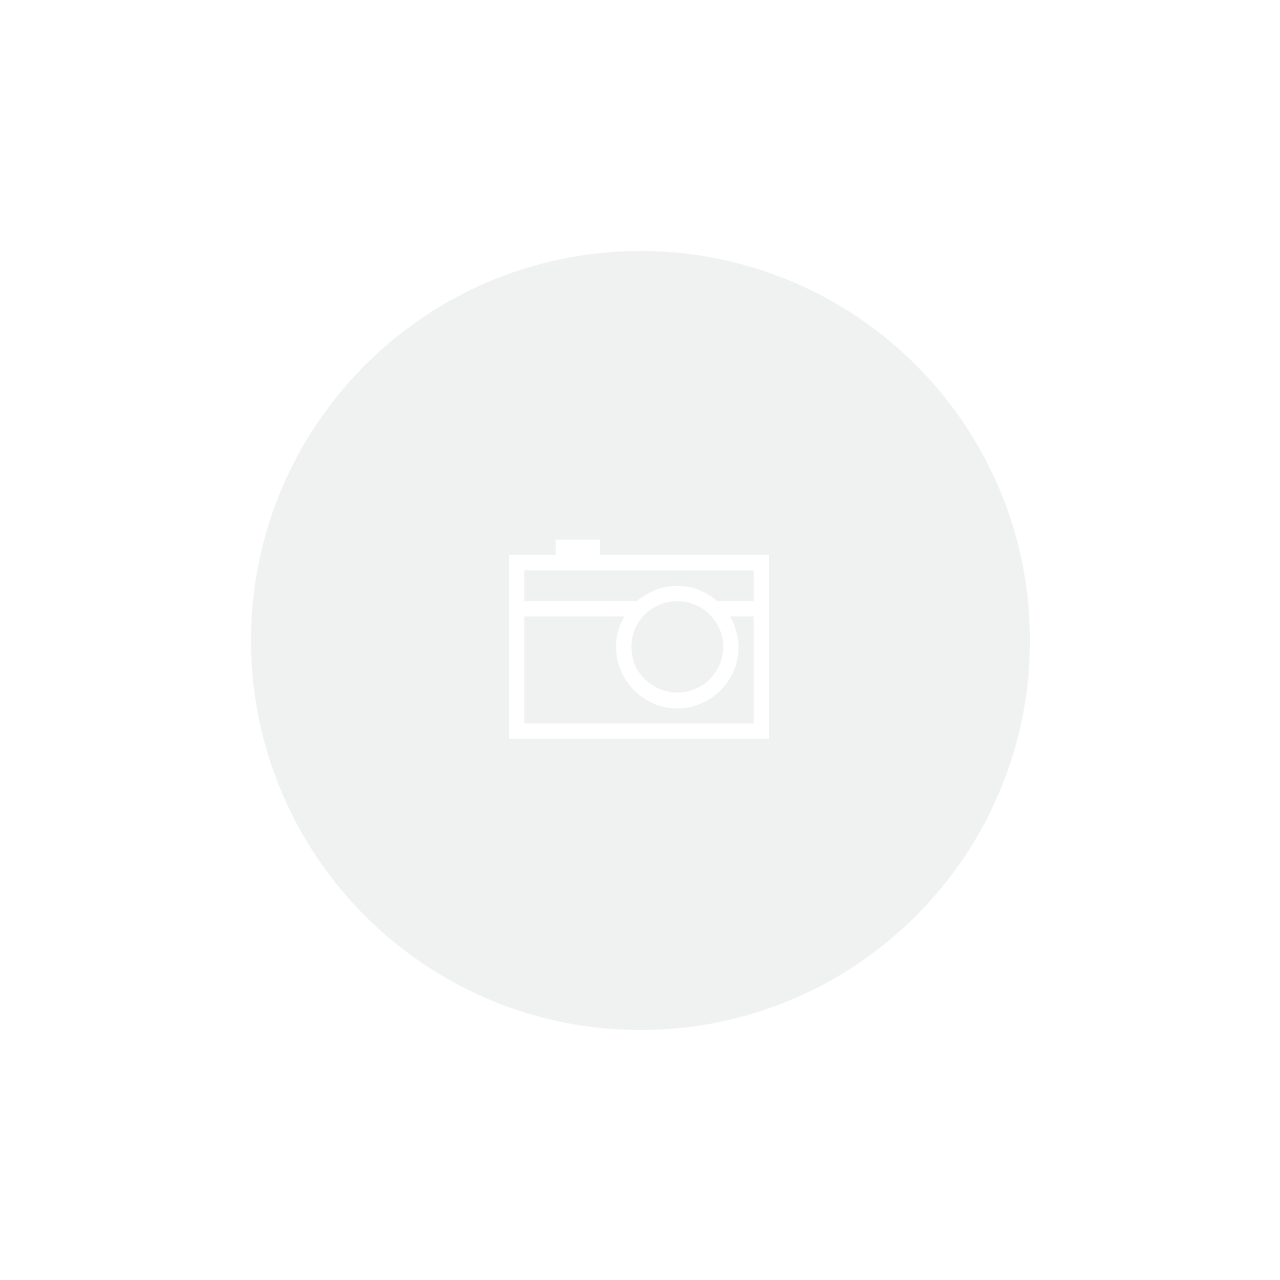 OLEO LUB. CERA SQUIRT LONG LASTING DRY LUBE P/ CORRENTE 15ML